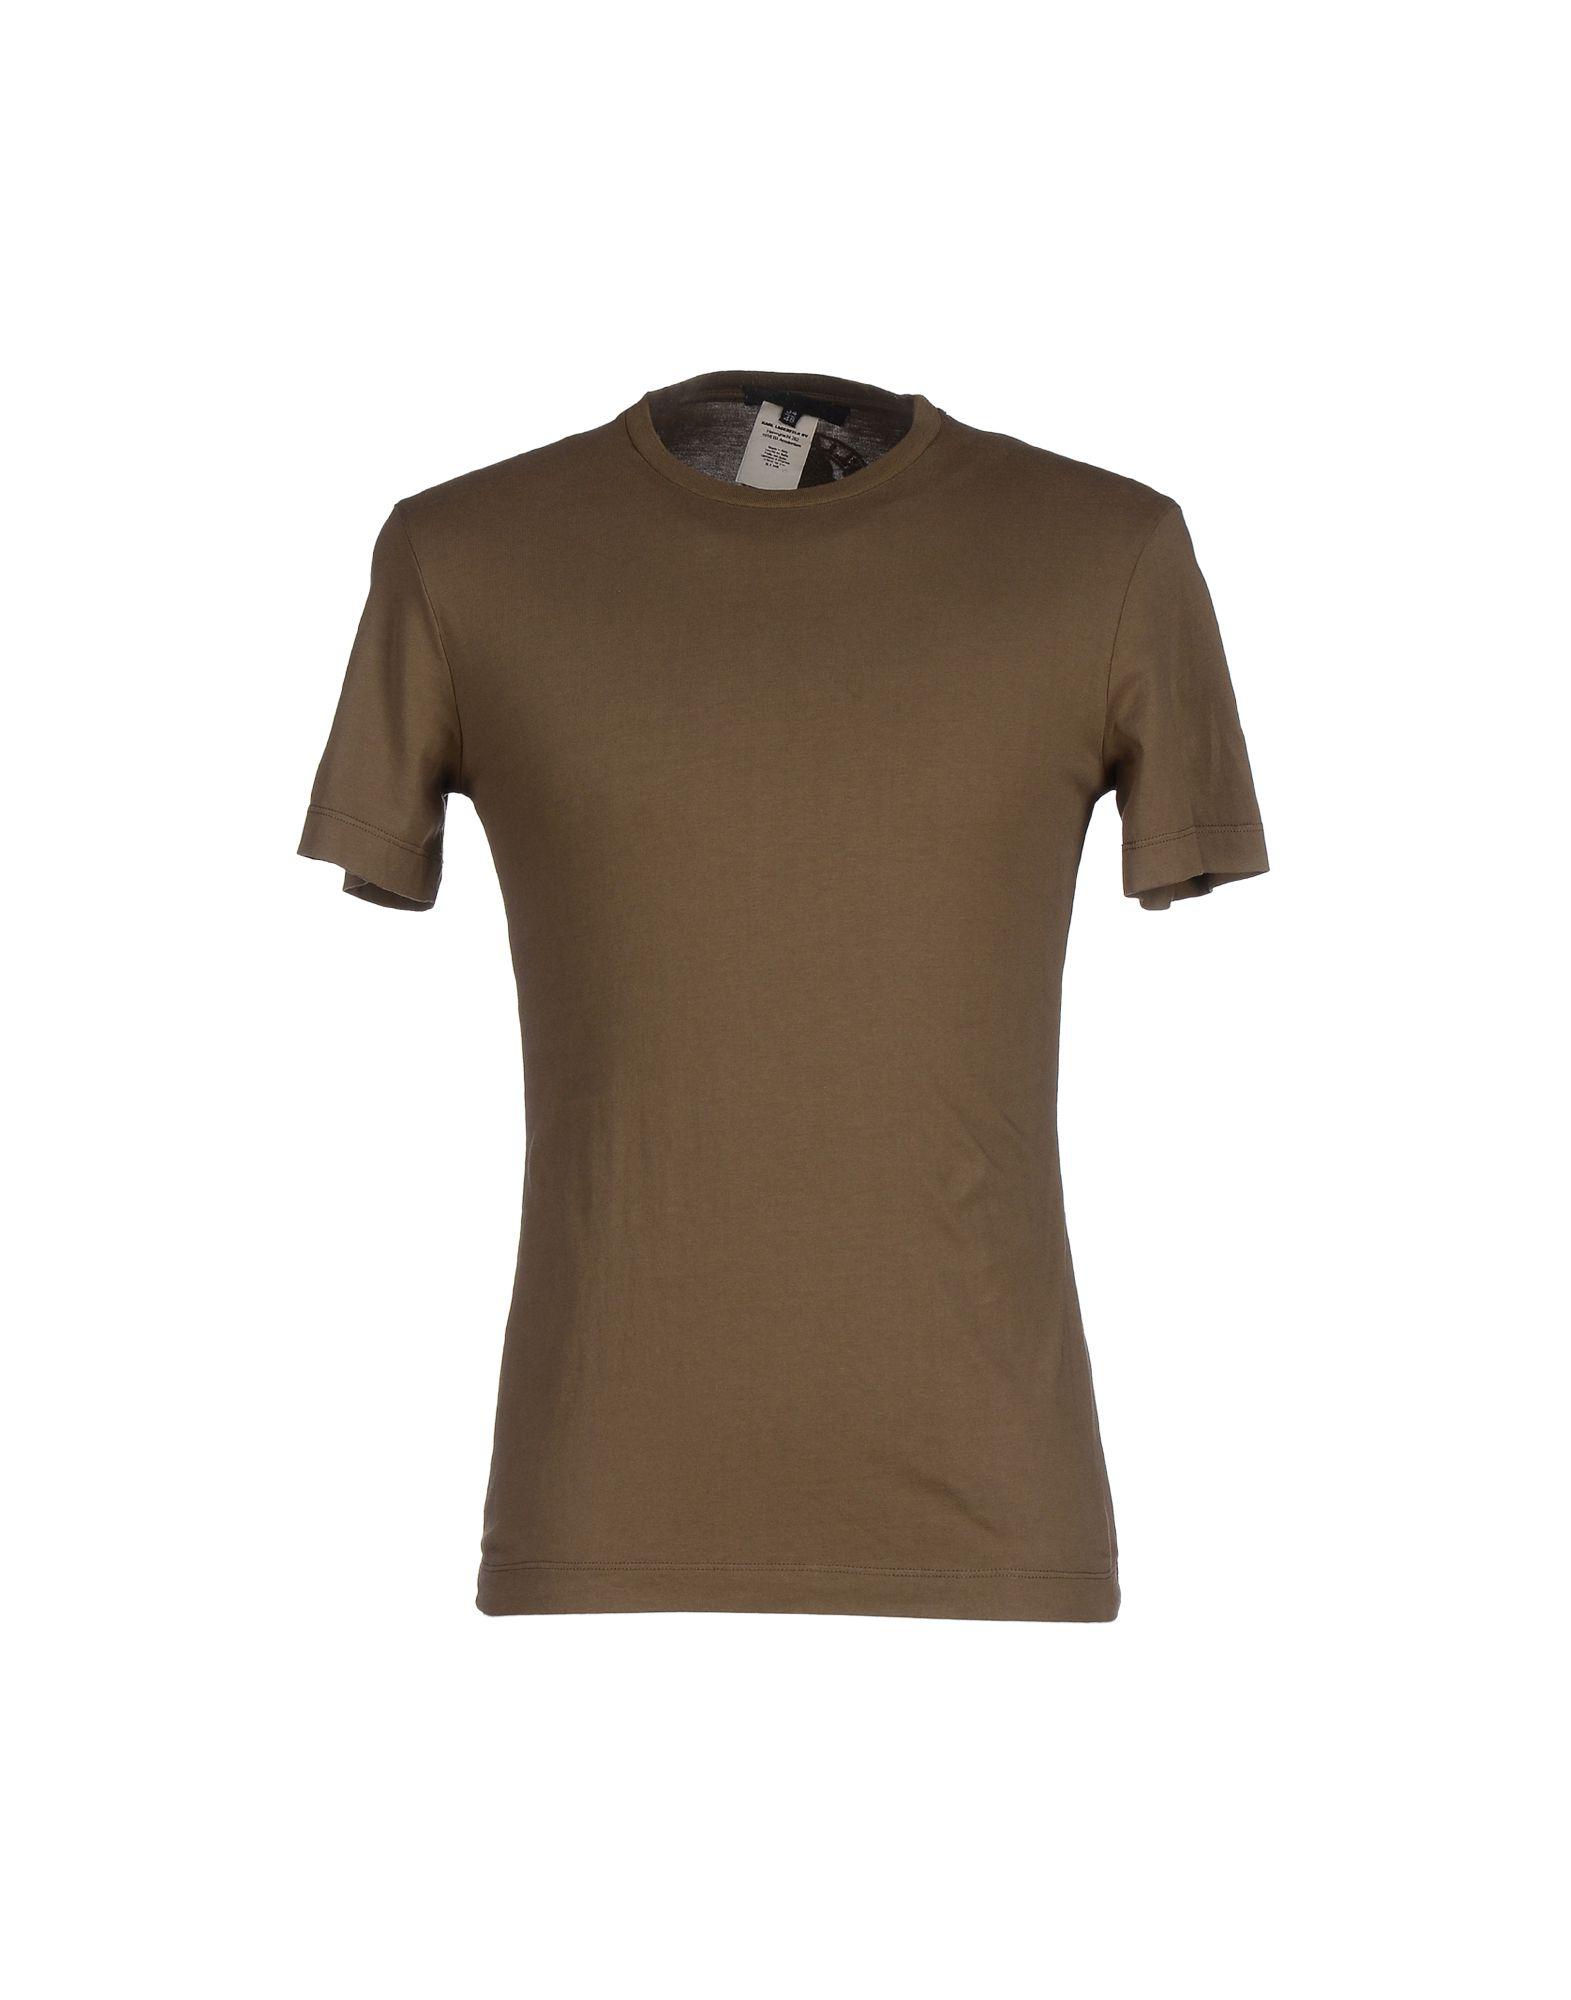 T-Shirt Karl Lagerfeld Uomo Uomo Lagerfeld - 37796463JC 0e09ef